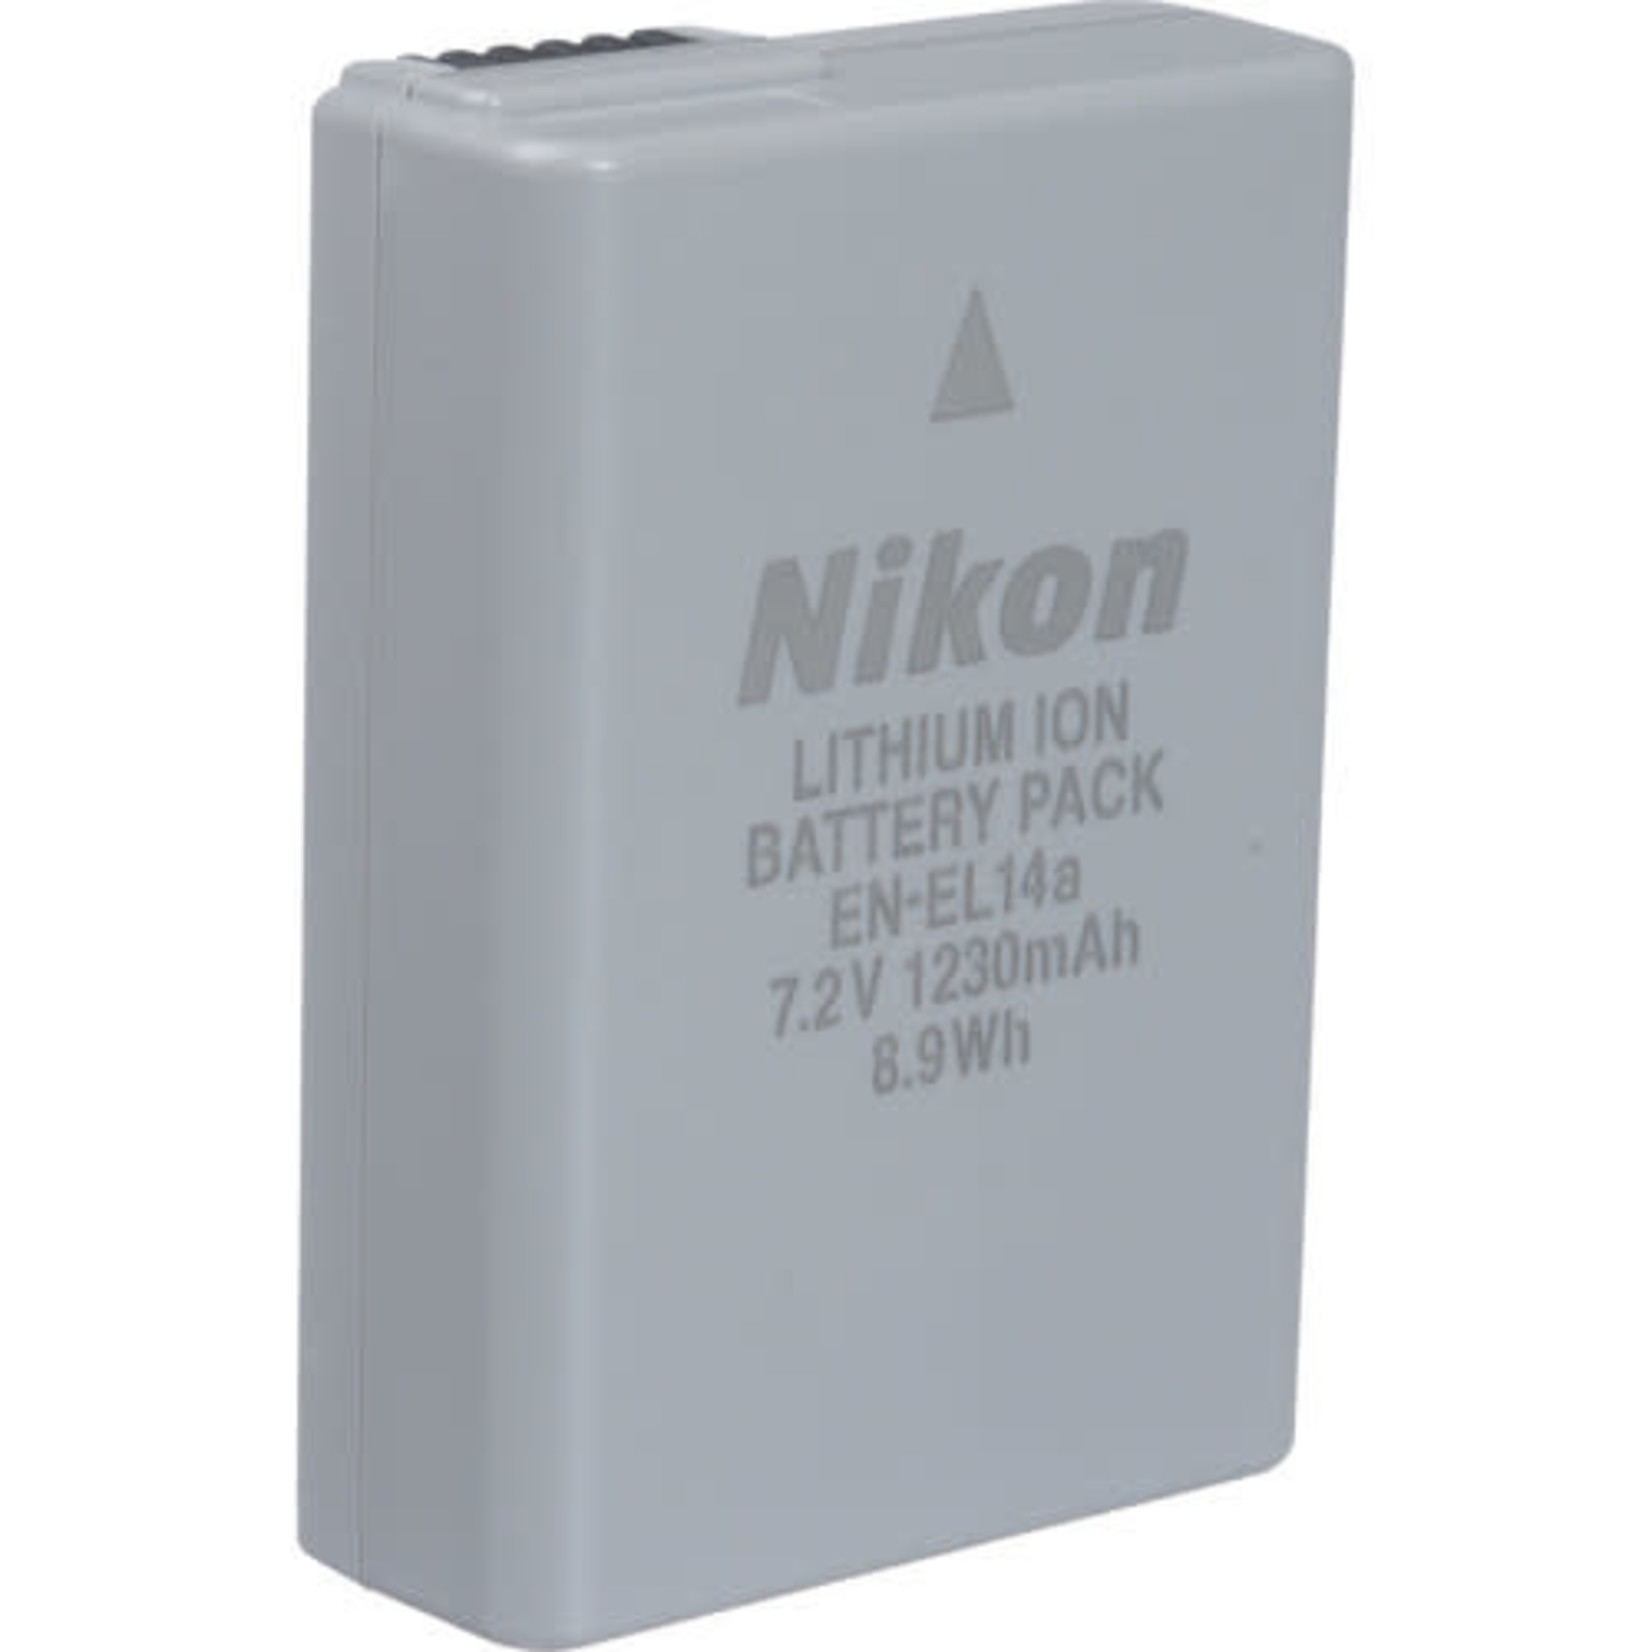 Nikon Nikon EN-EL14a Rechargeable Lithium-Ion Battery